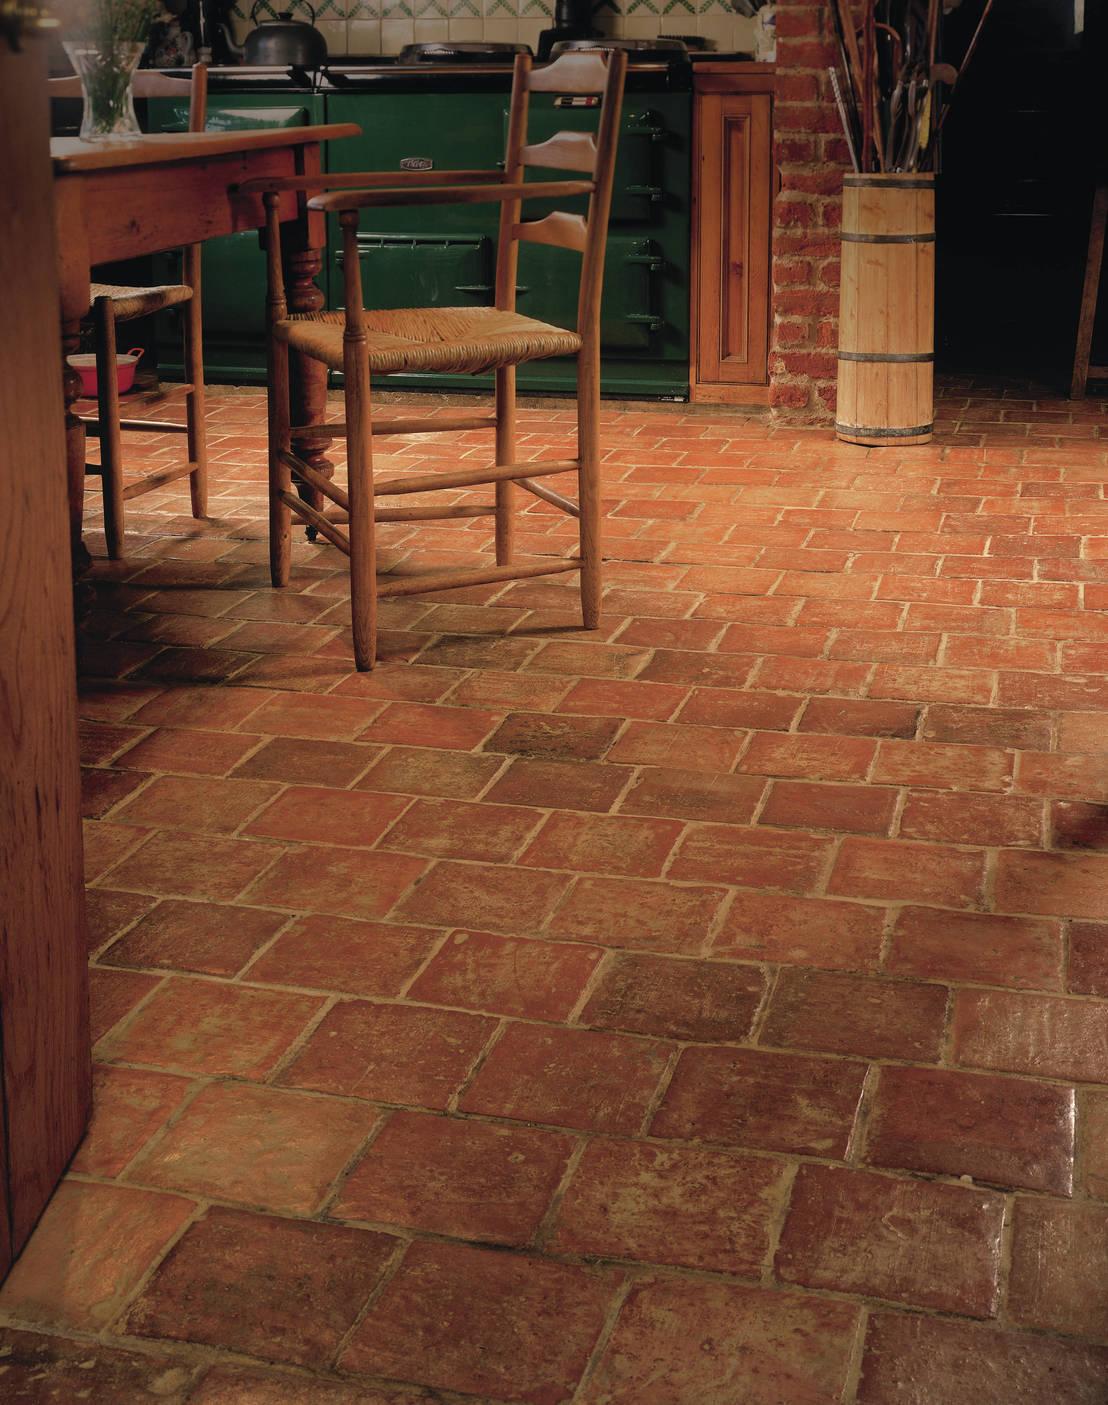 7 ideas de pisos r sticos para tu cocina for Pisos para patios interiores